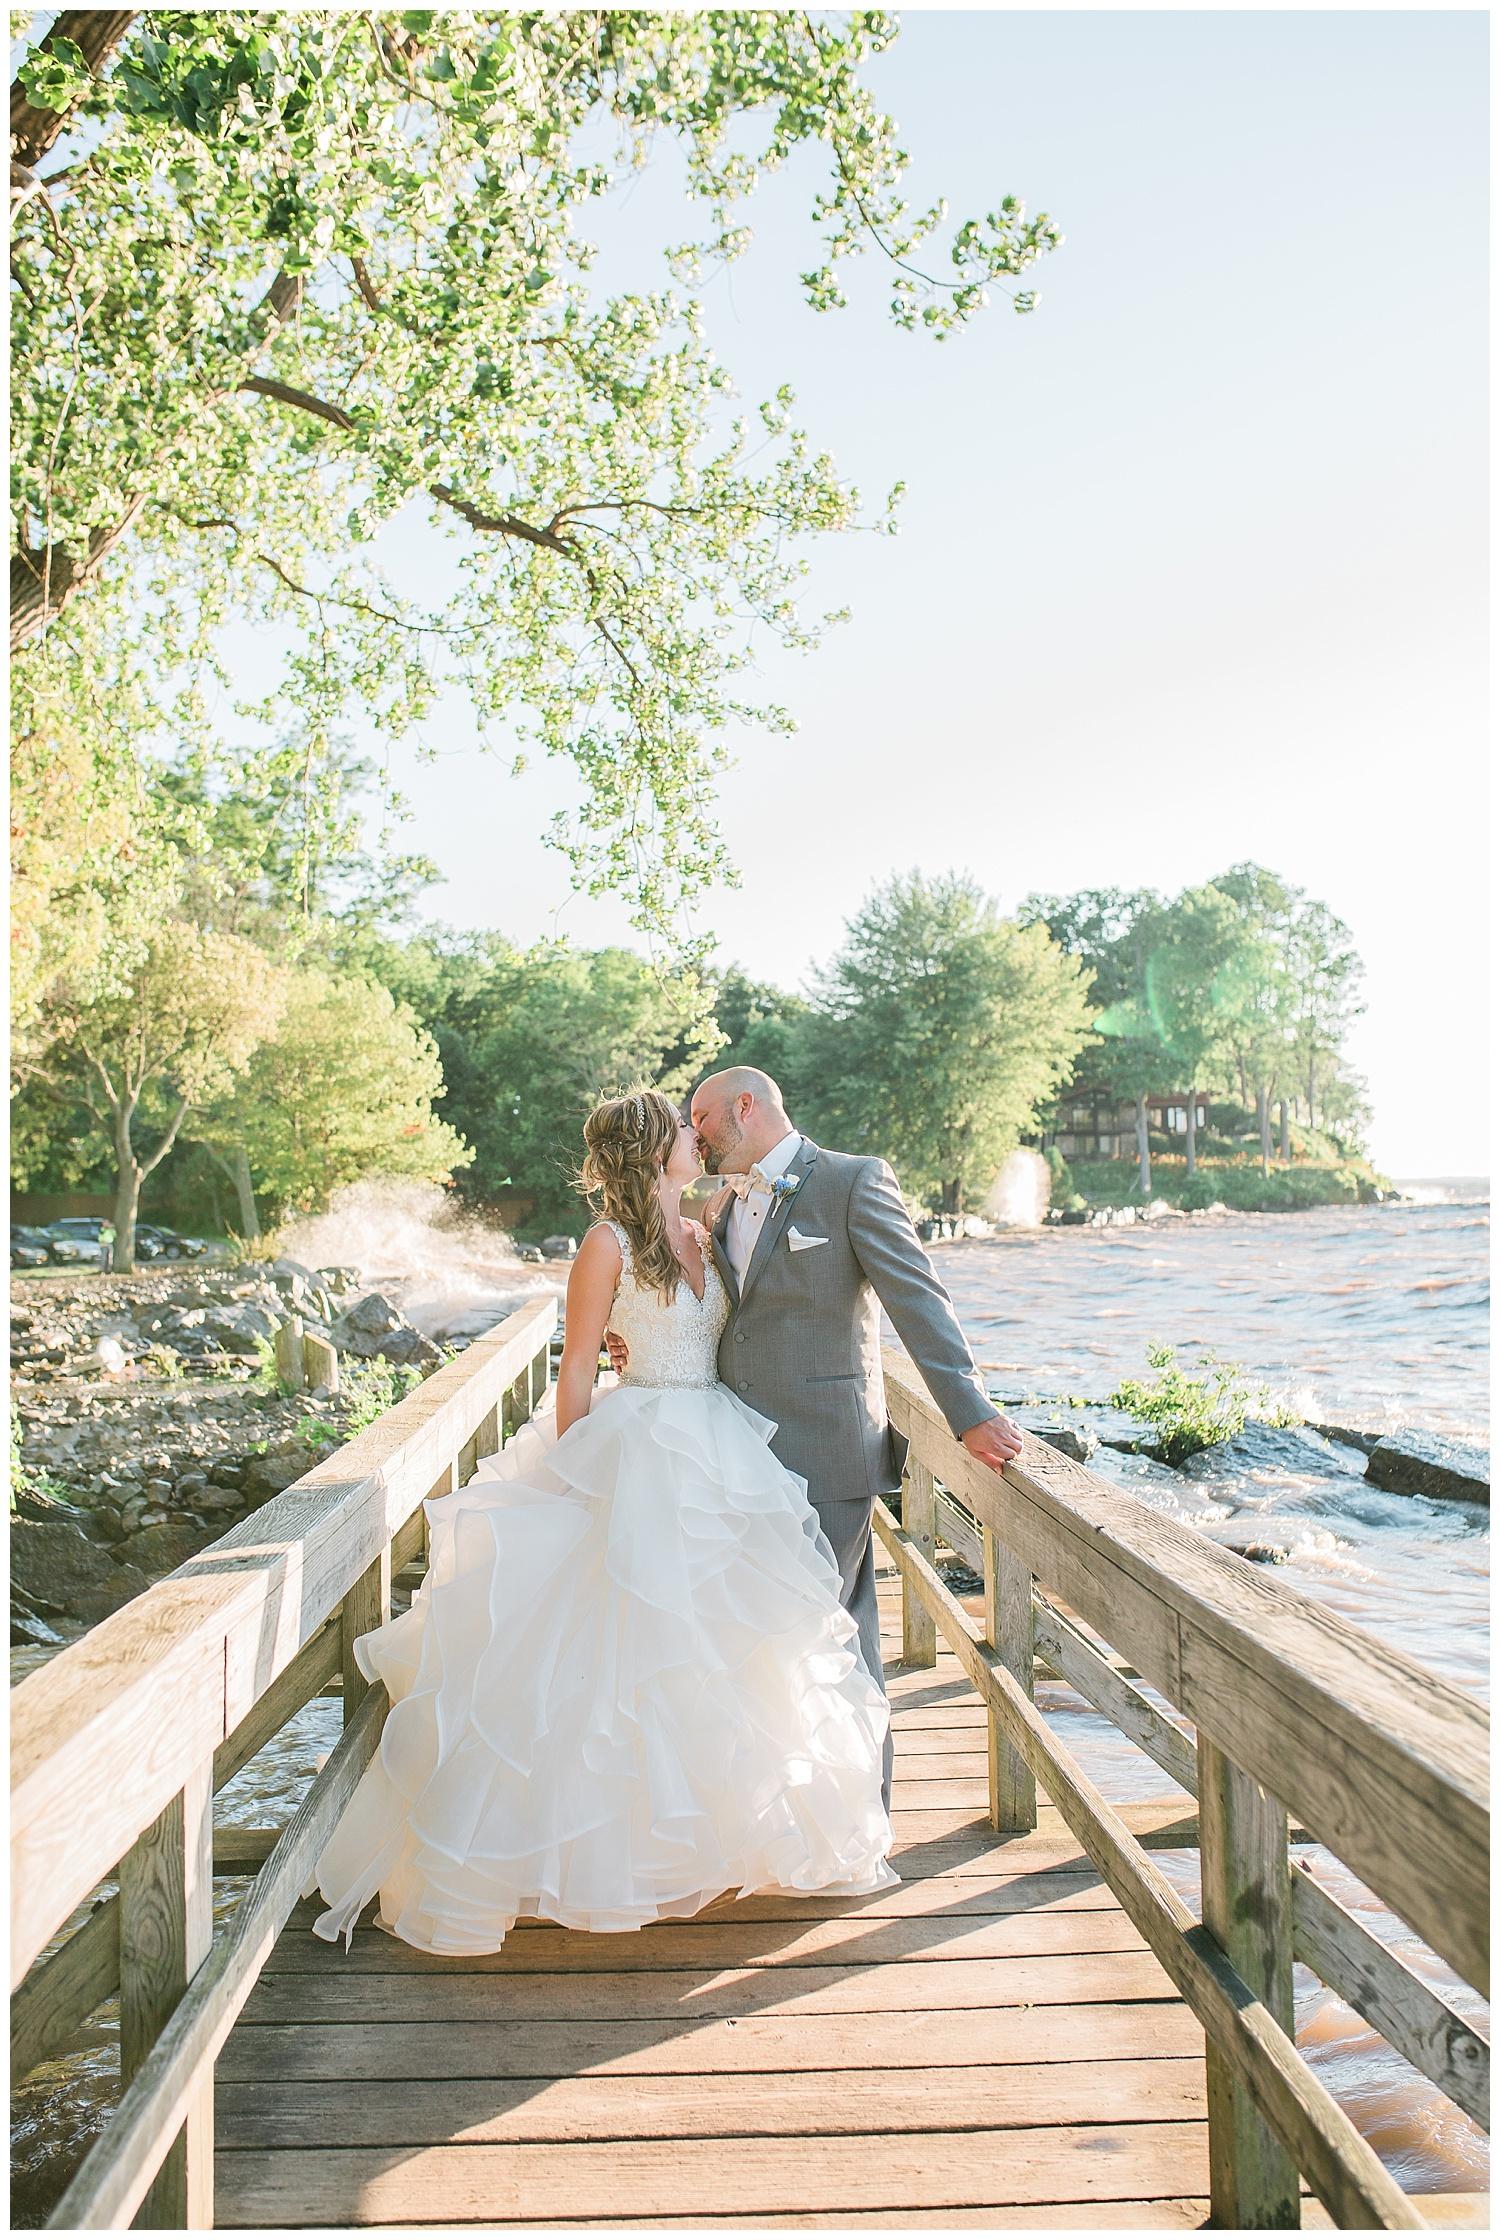 Sean and Andrea - Webster wedding - lass and beau-1136_Buffalo wedding photography.jpg